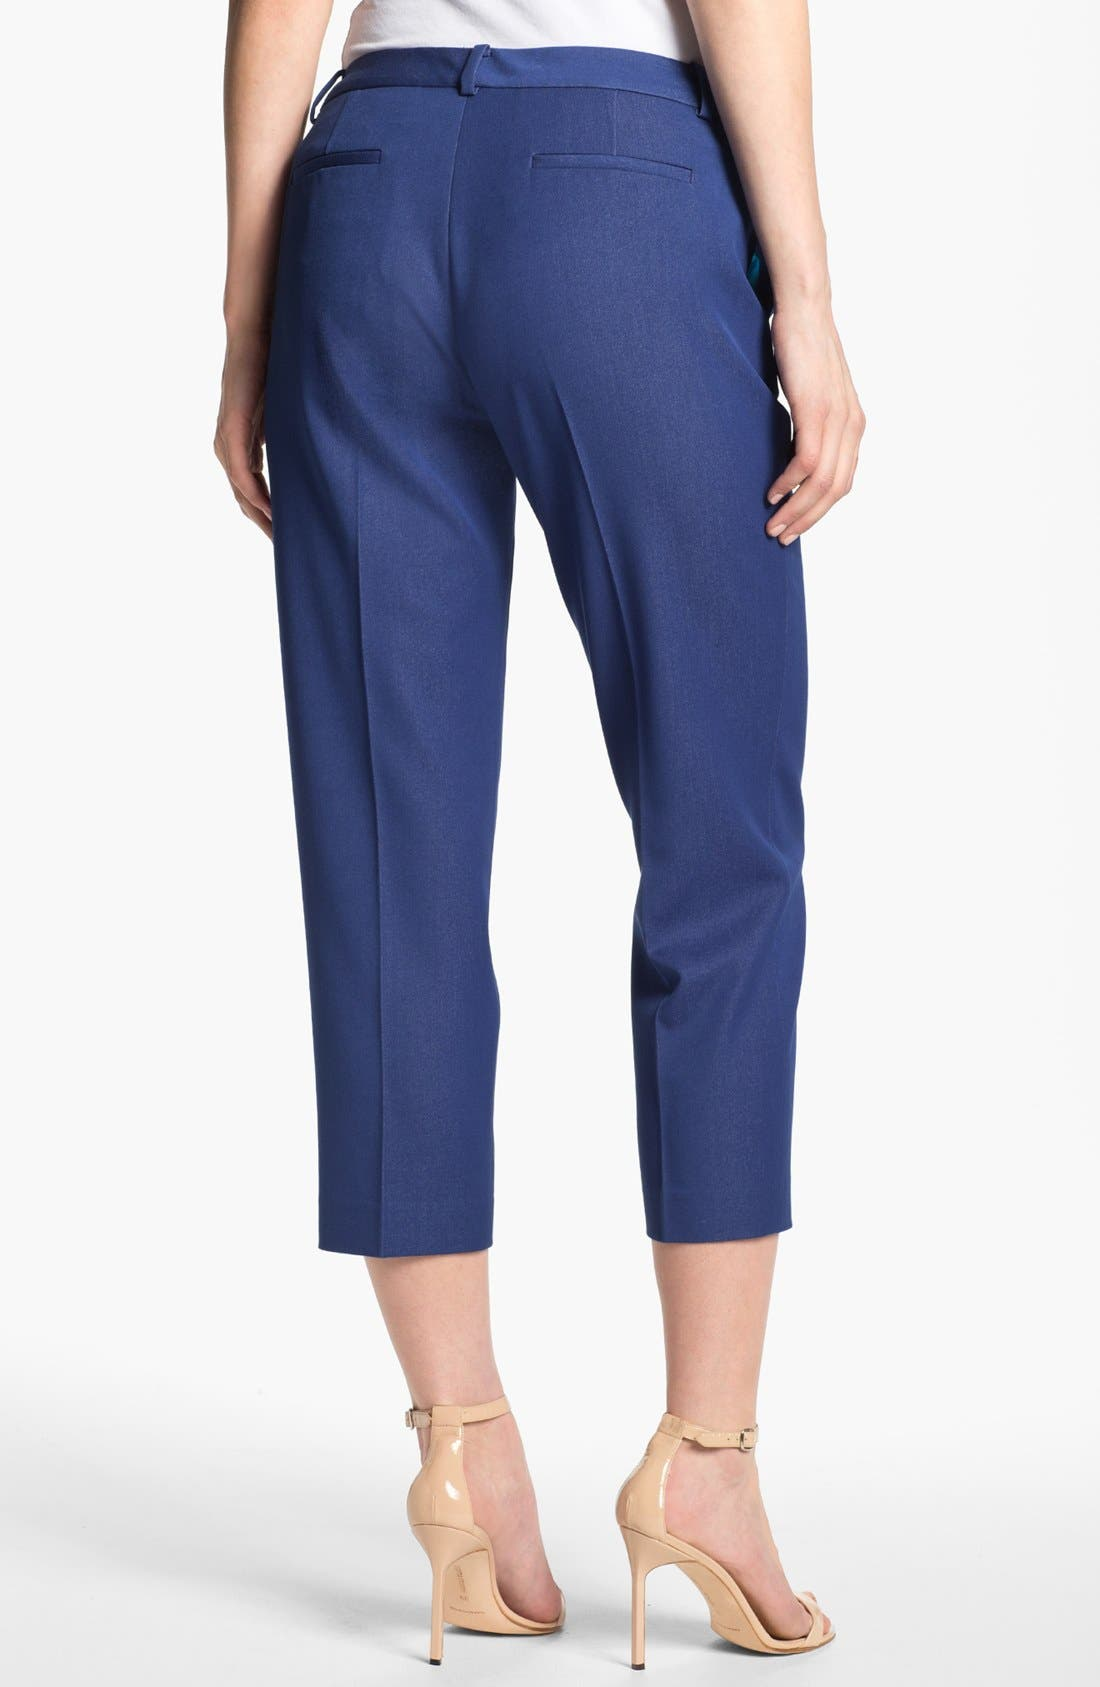 Alternate Image 3  - T Tahari 'Cabana' Crop Pants (Petite) (Online Only)